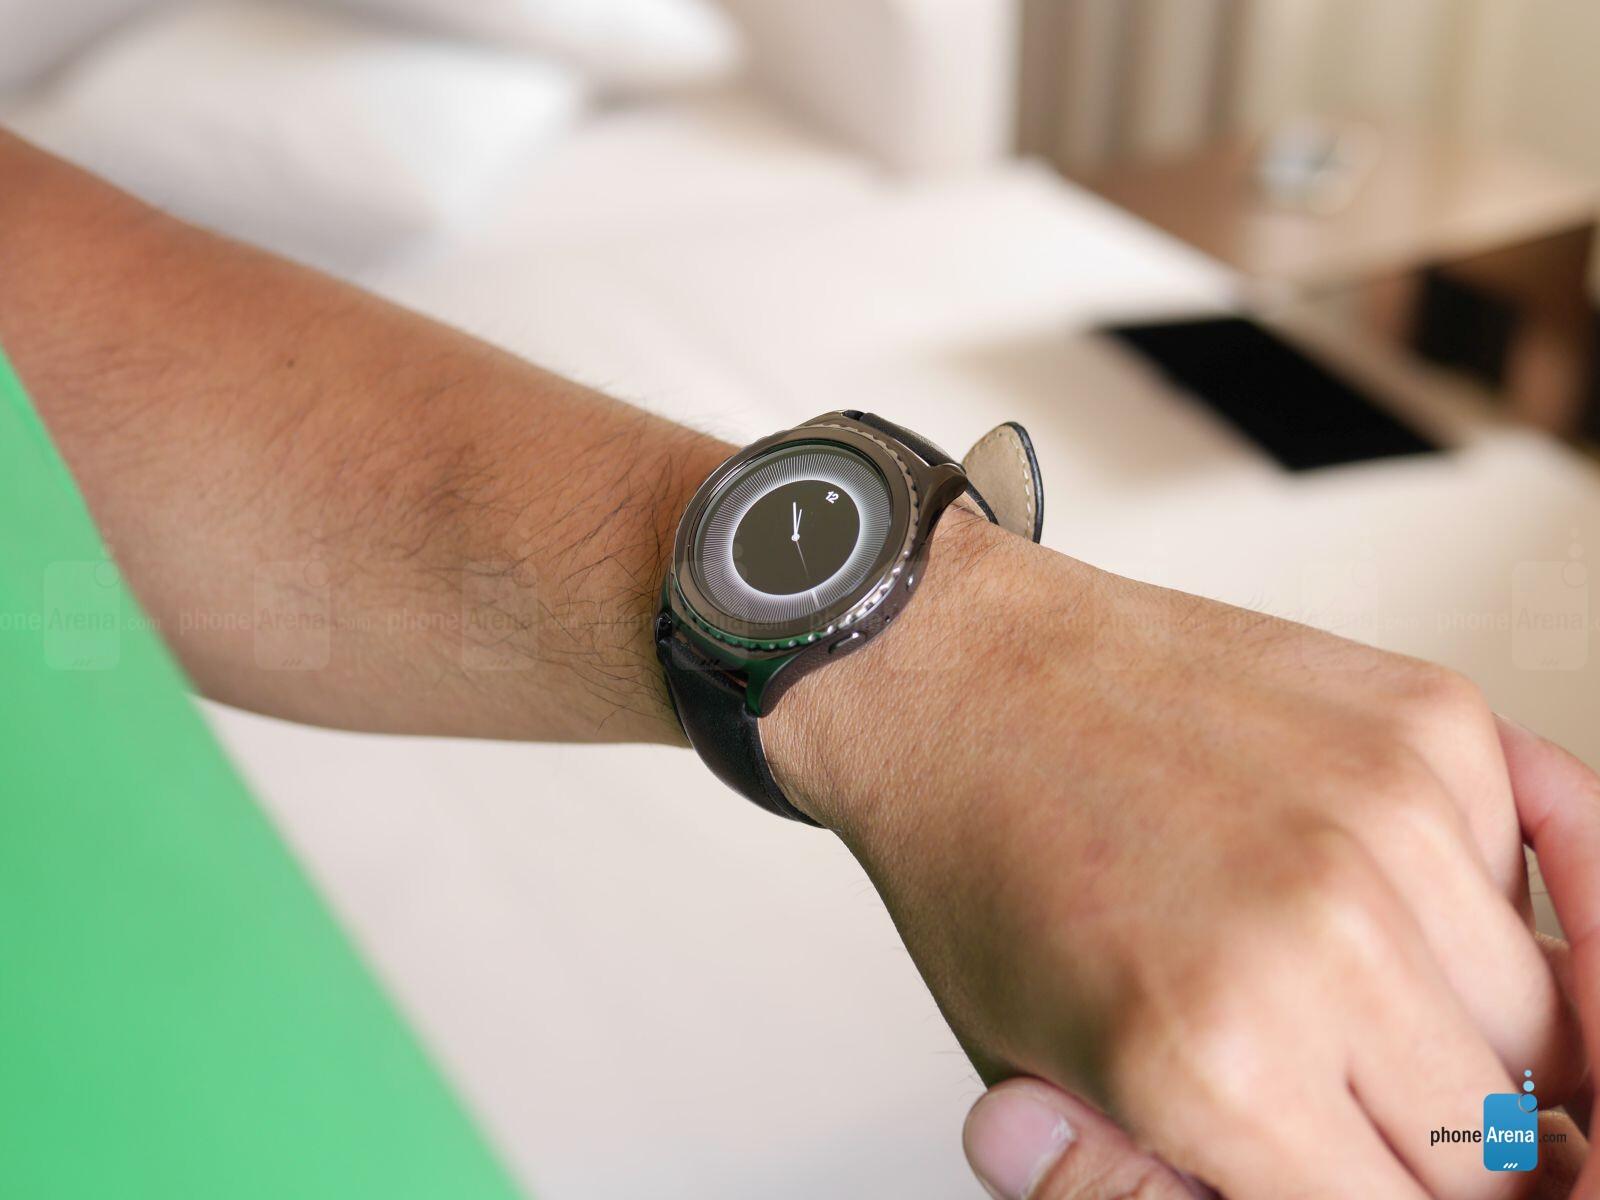 Cyber Monday deals: smartphones, smartwatches, accessories